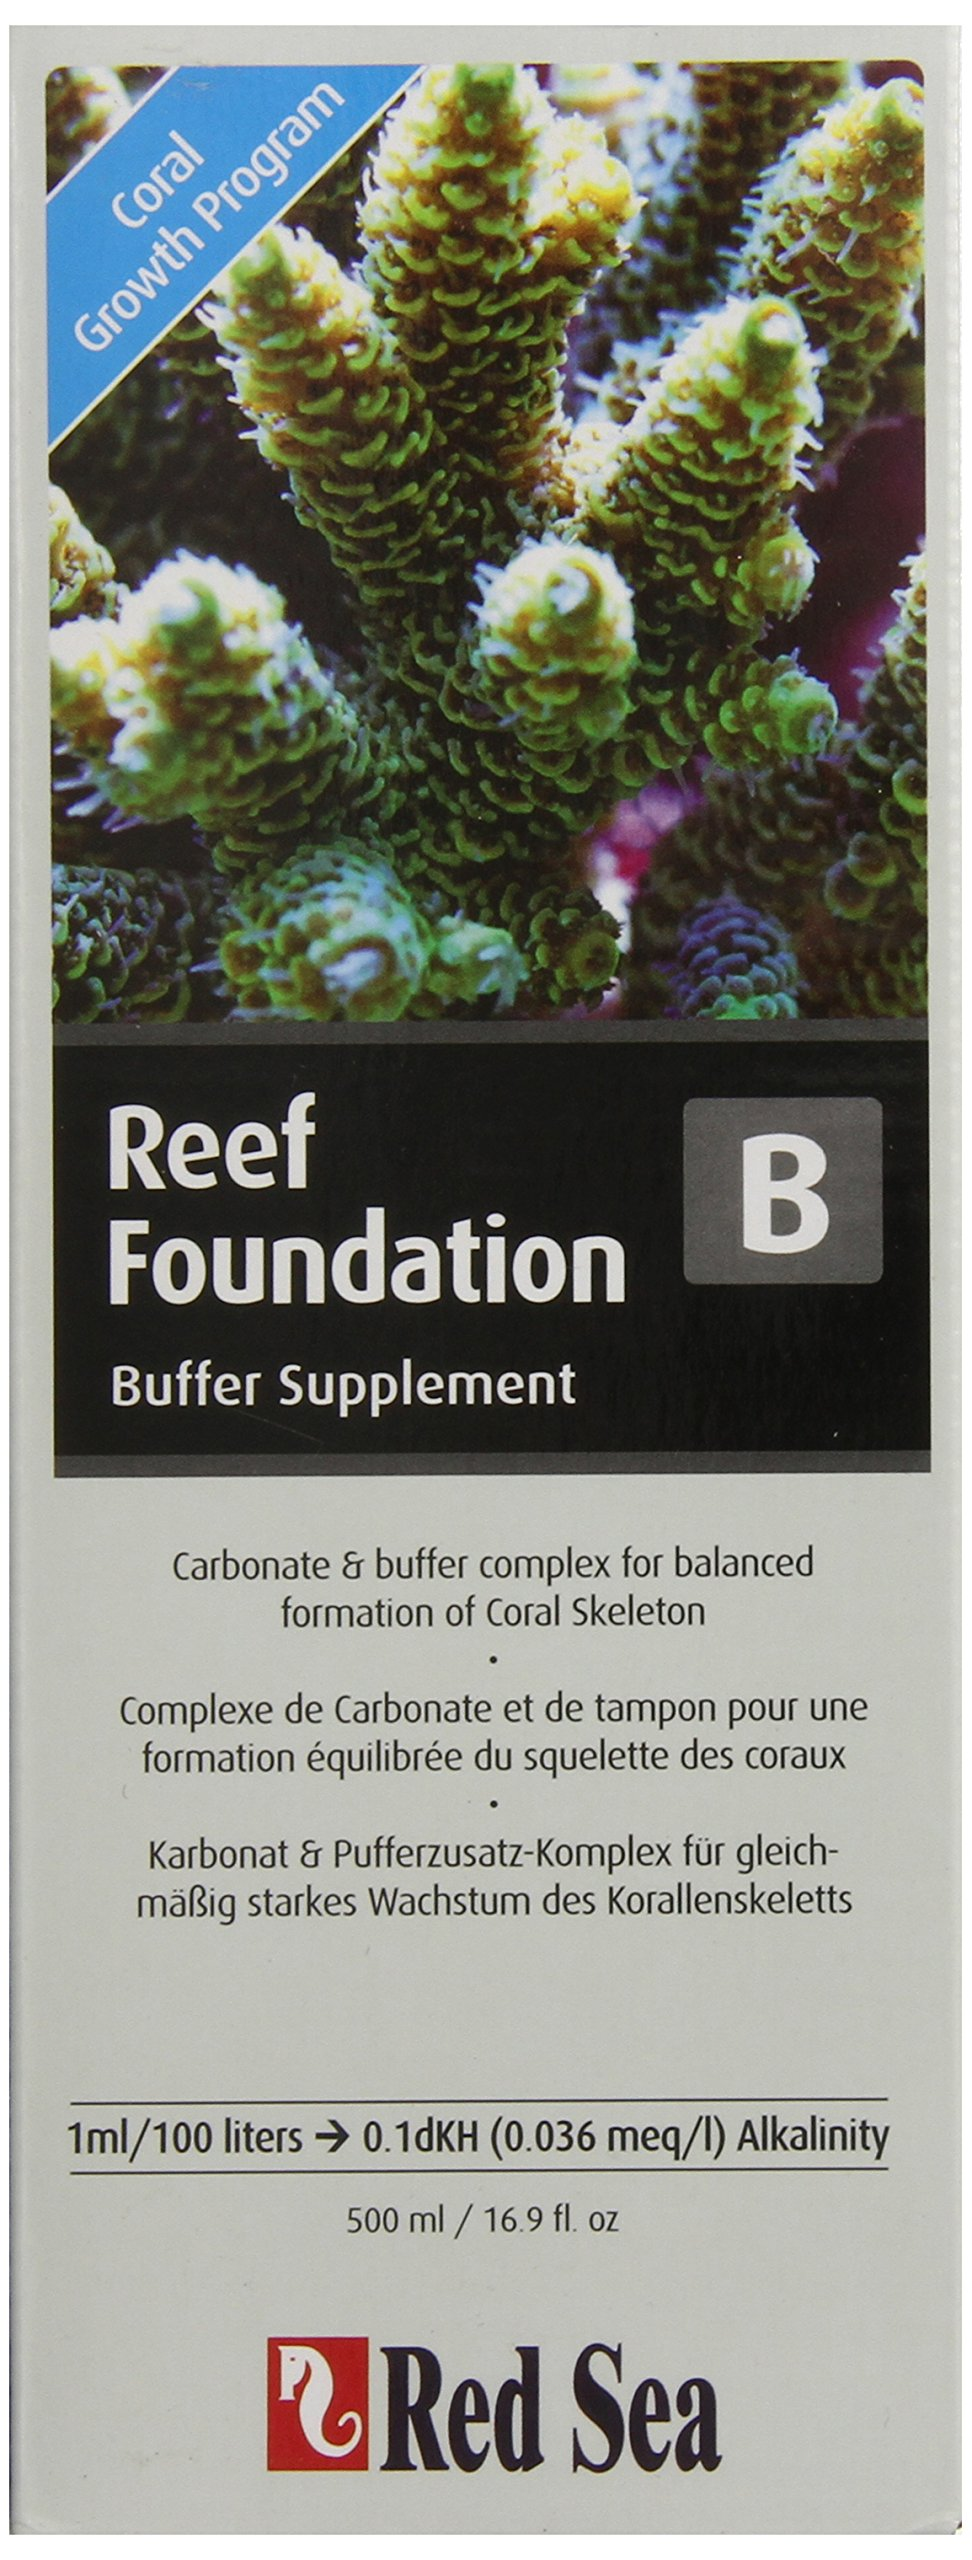 Red Sea Fish Pharm ARE22023 Reef Foundation Buffer Supplement-B for Aquarium, 500ml